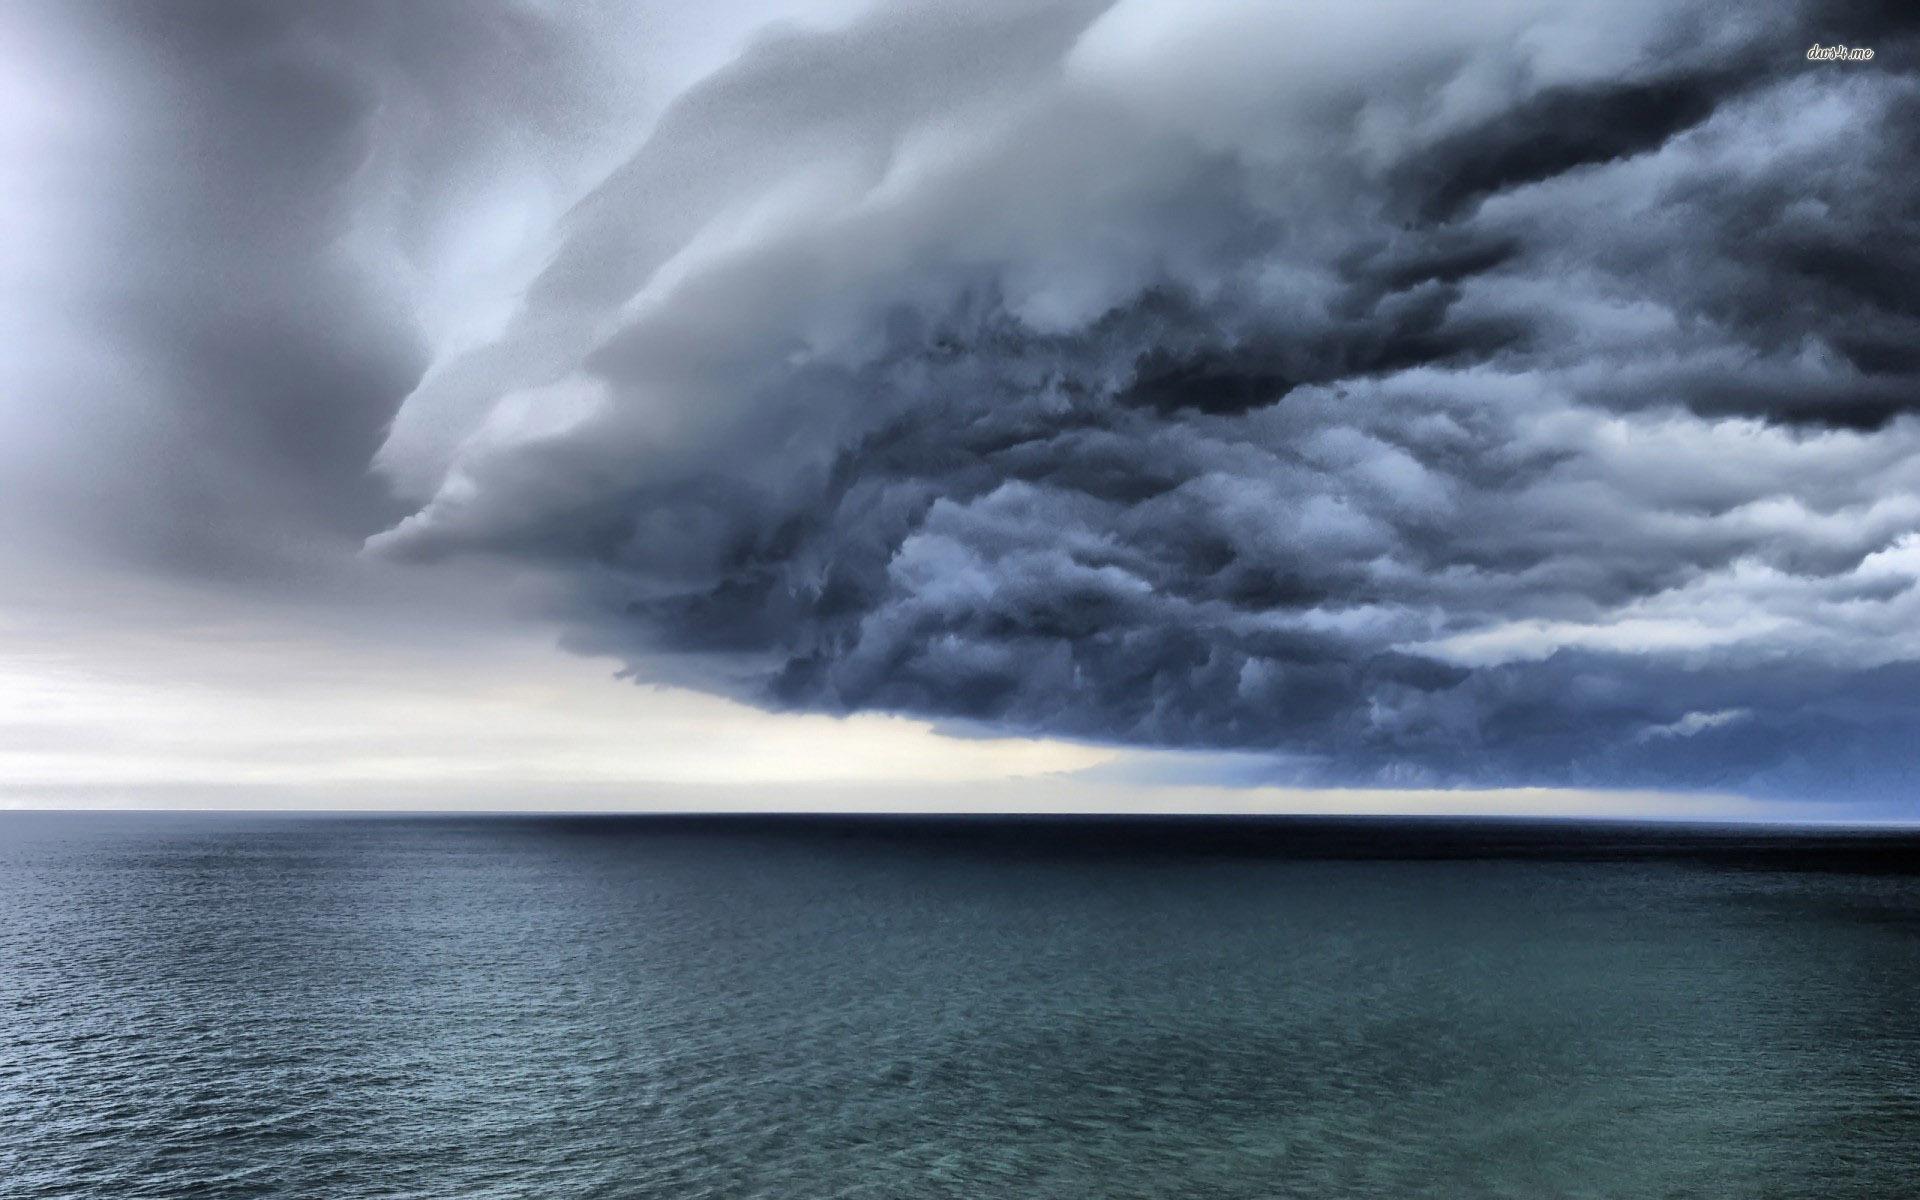 Storm clouds over the ocean wallpaper   Beach wallpapers   10506 1920x1200